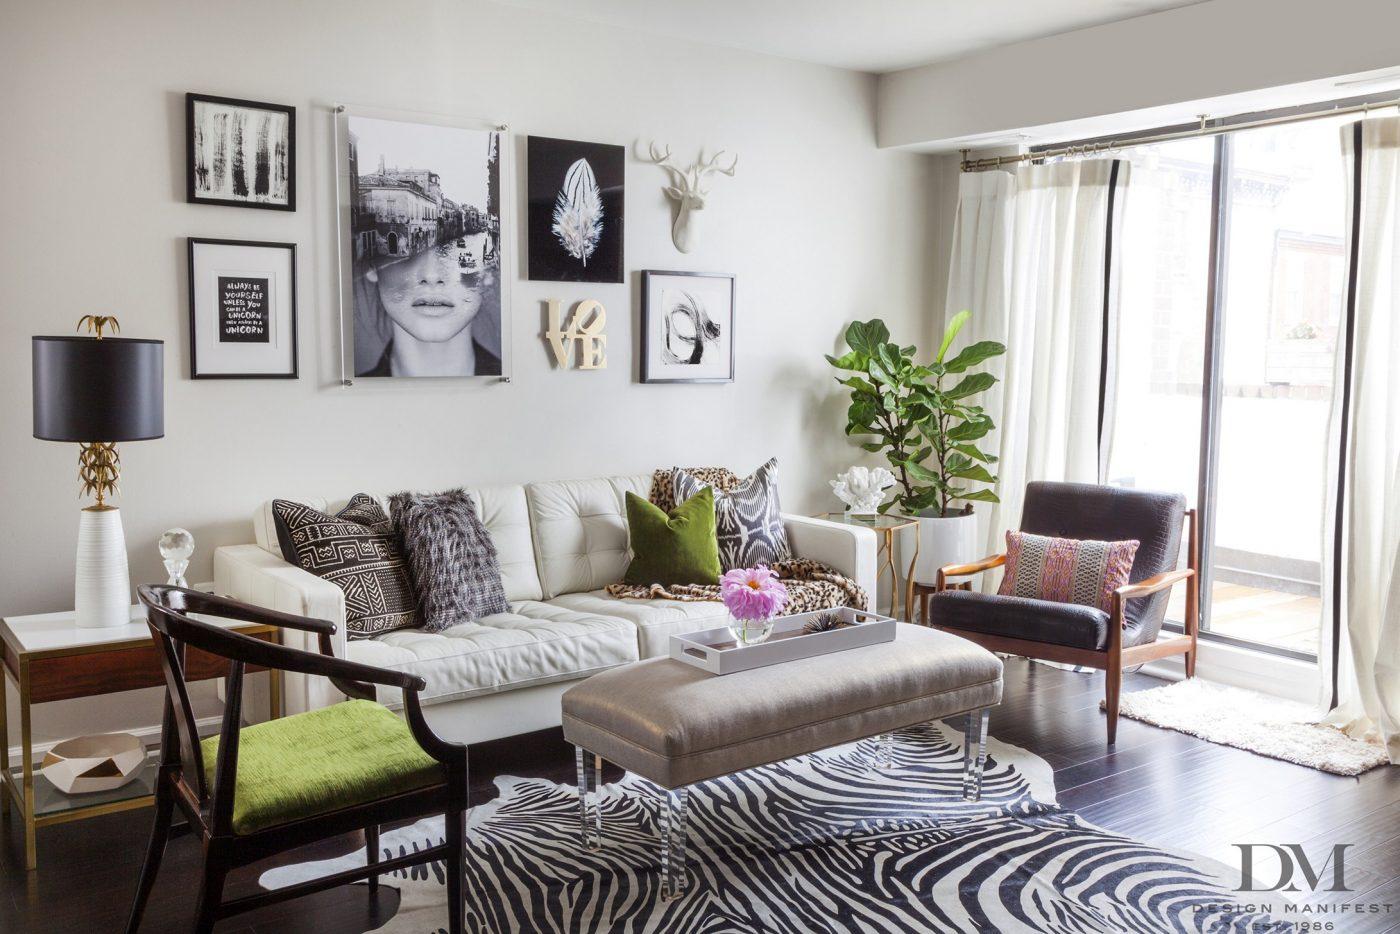 Decorează ți Casa 238 N Stilul Eclectic Glam News Magazine